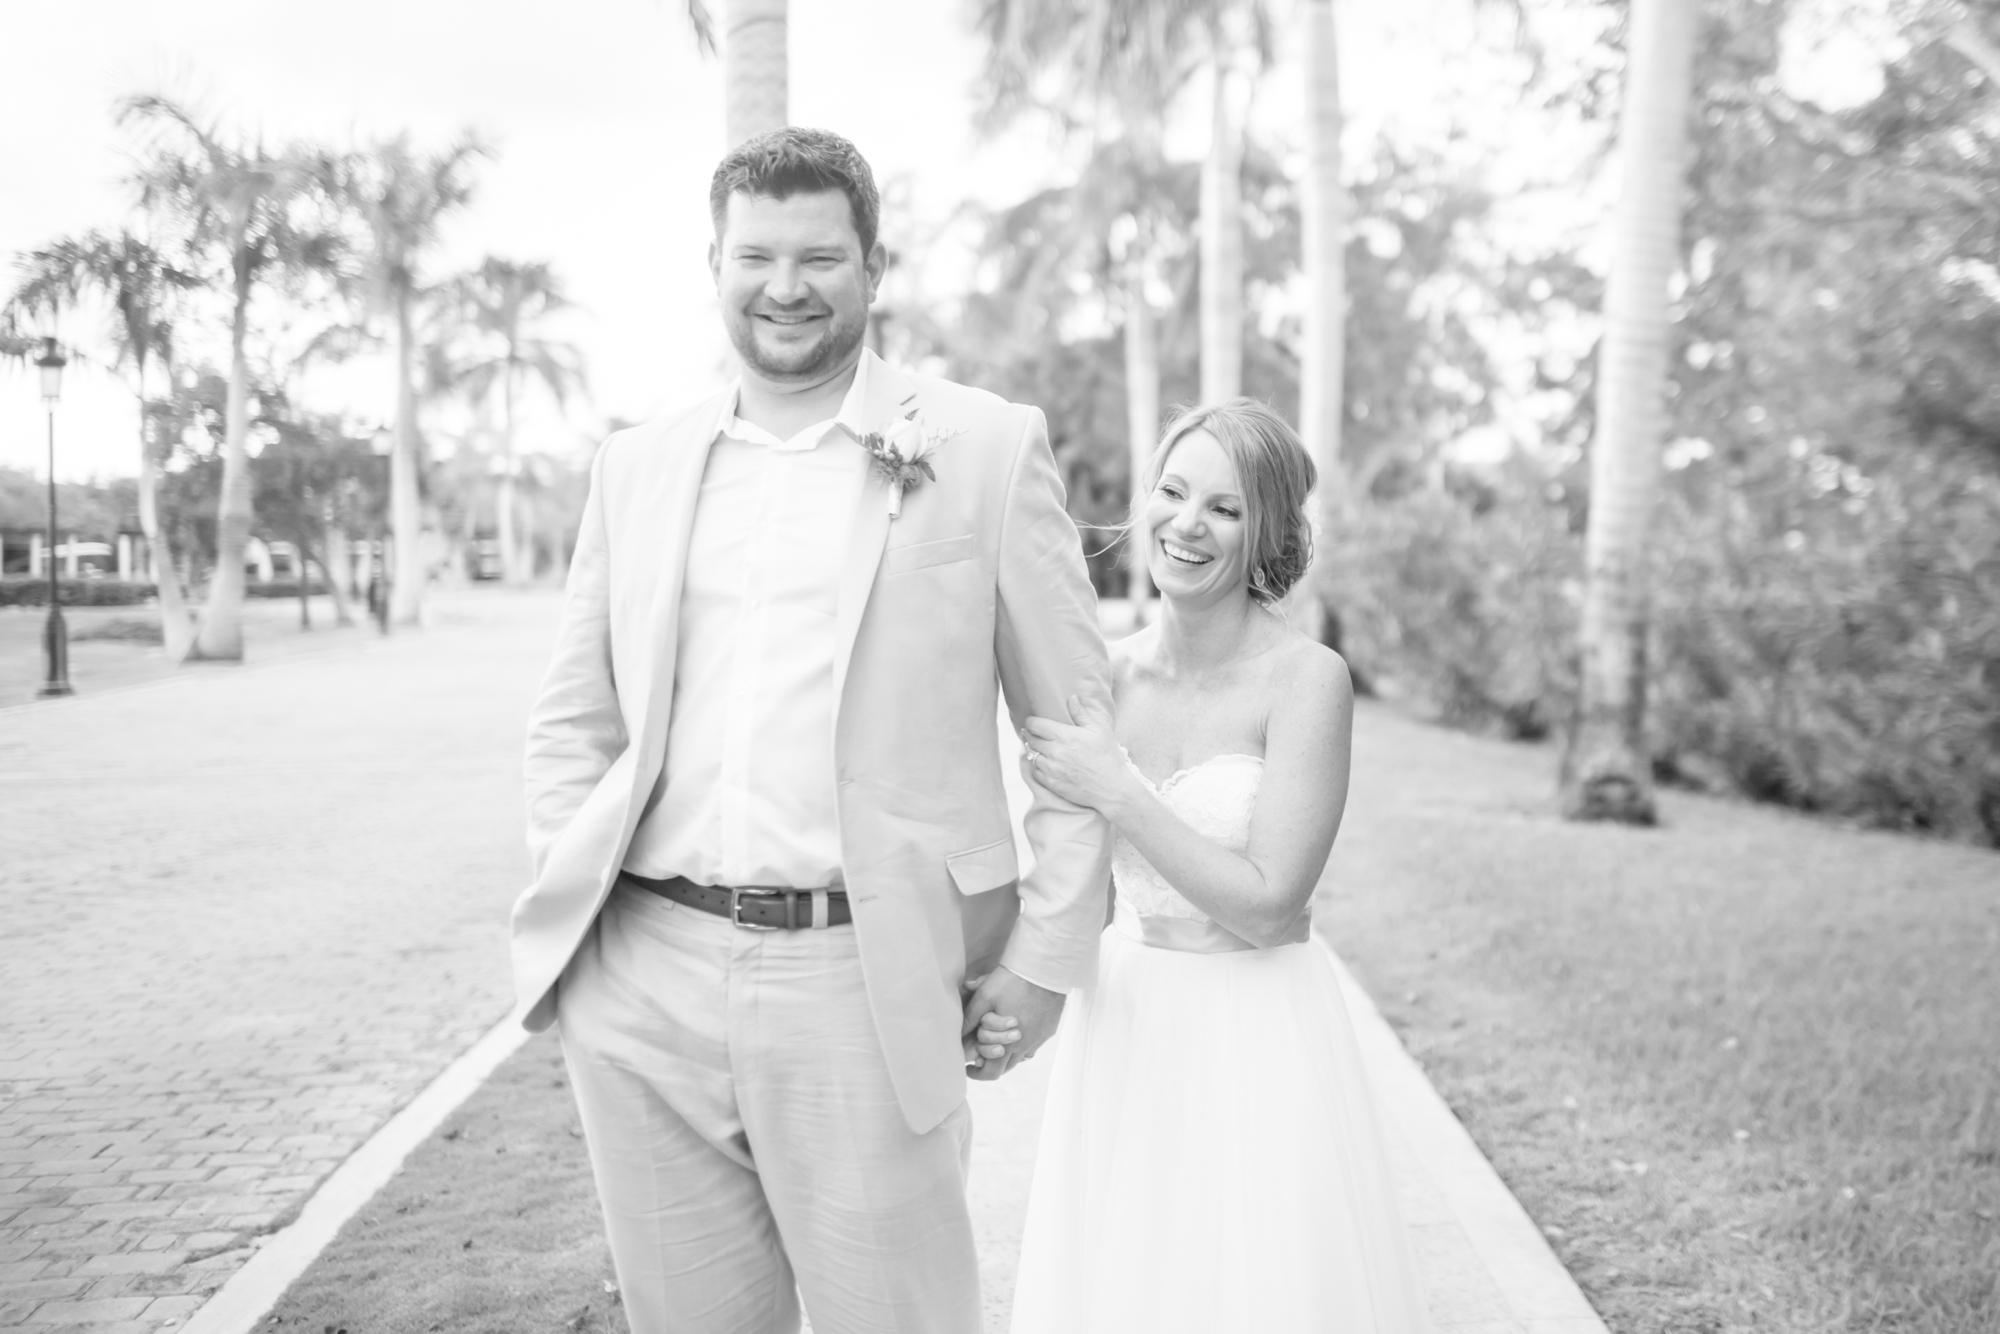 Morosoff Wedding 4-Bride & Groom Portraits-535_anna grace photography destination wedding photographer playa del carmen mexico photo.jpg